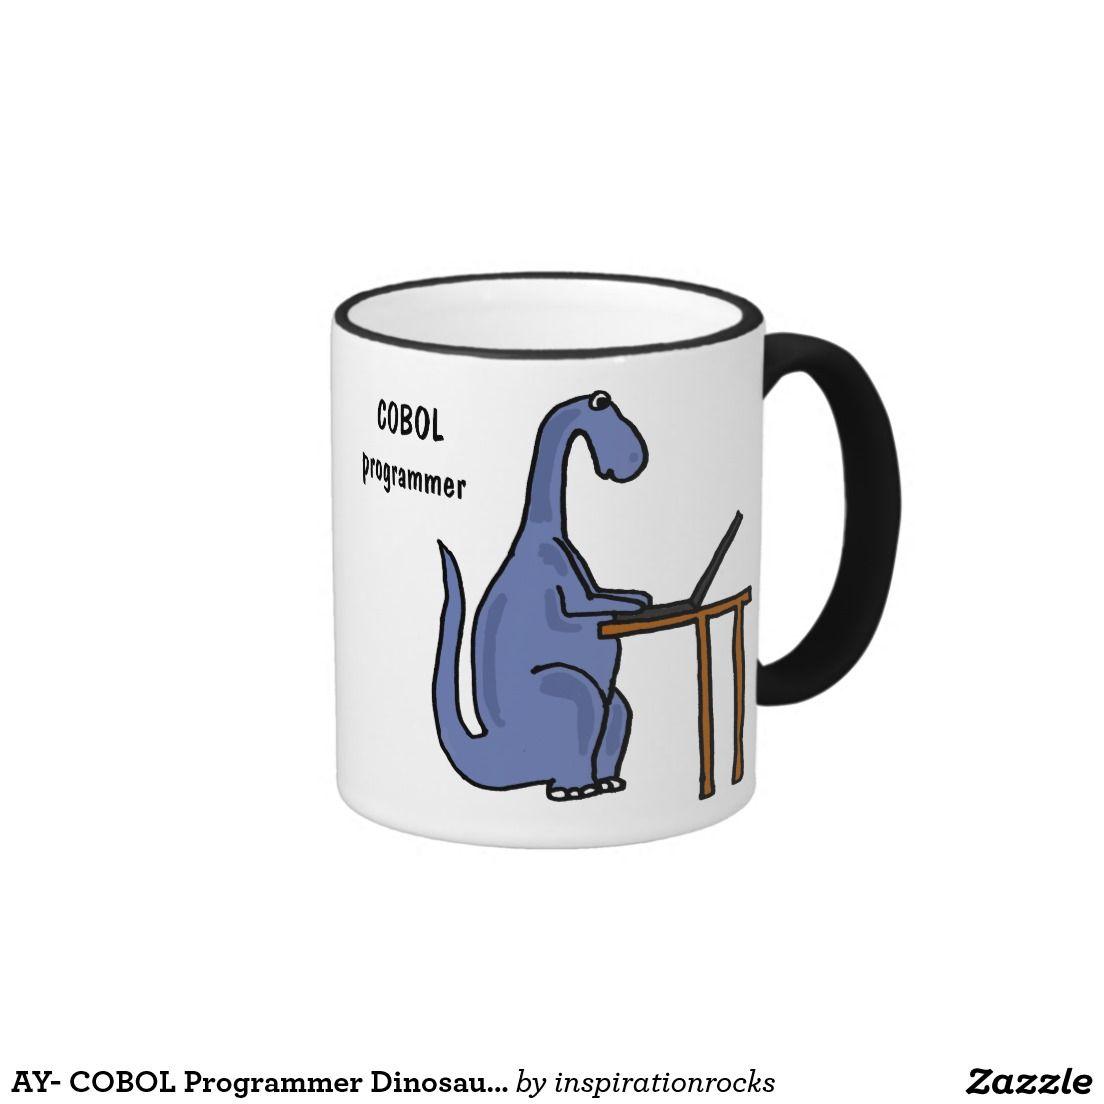 Ay cobol programmer dinosaur mug